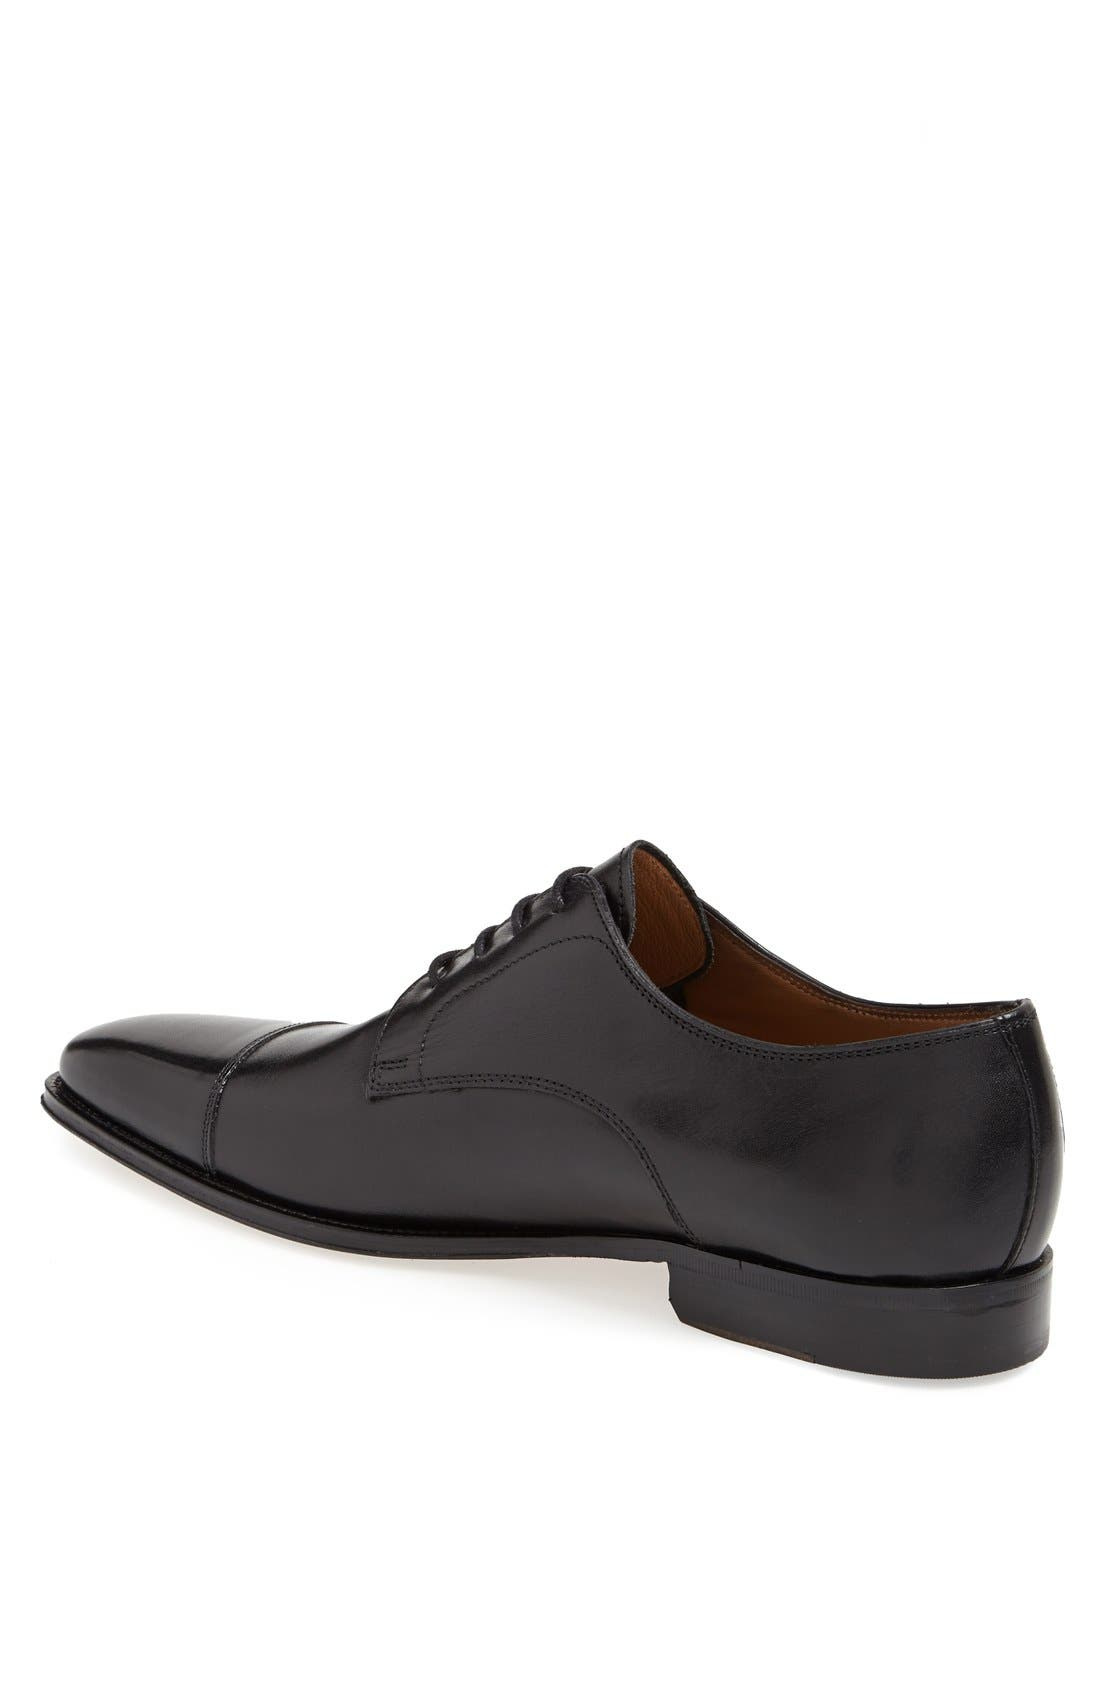 FLORSHEIM, Classico Cap Toe Oxford, Alternate thumbnail 2, color, BLACK